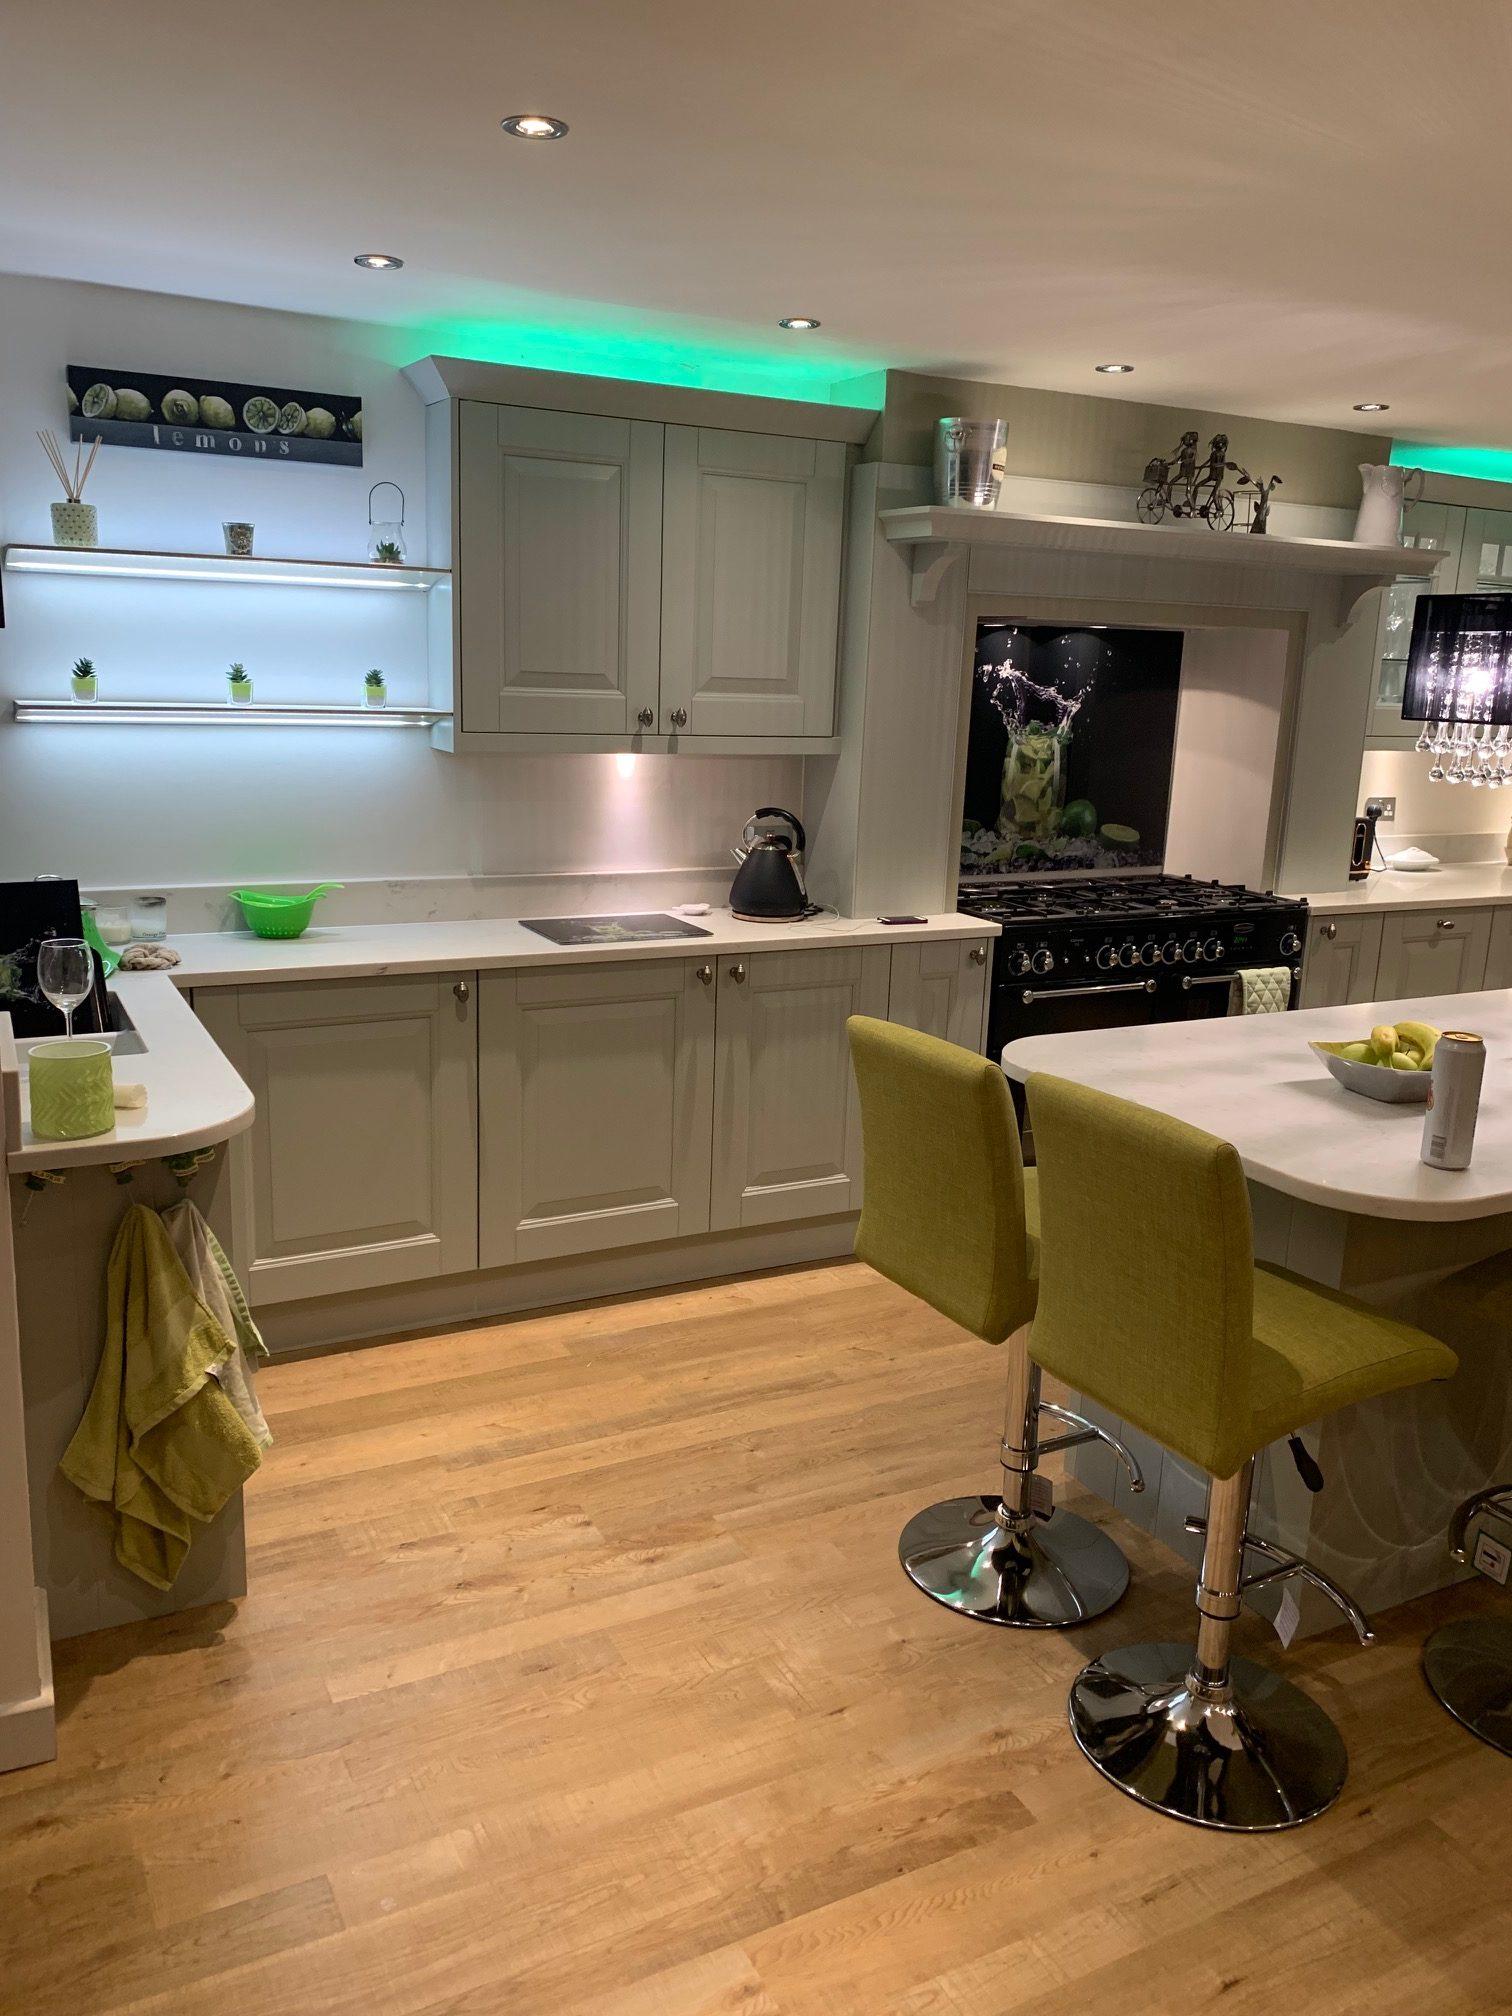 poynton_cheshire_house_refurbishment_5-e1563027081697